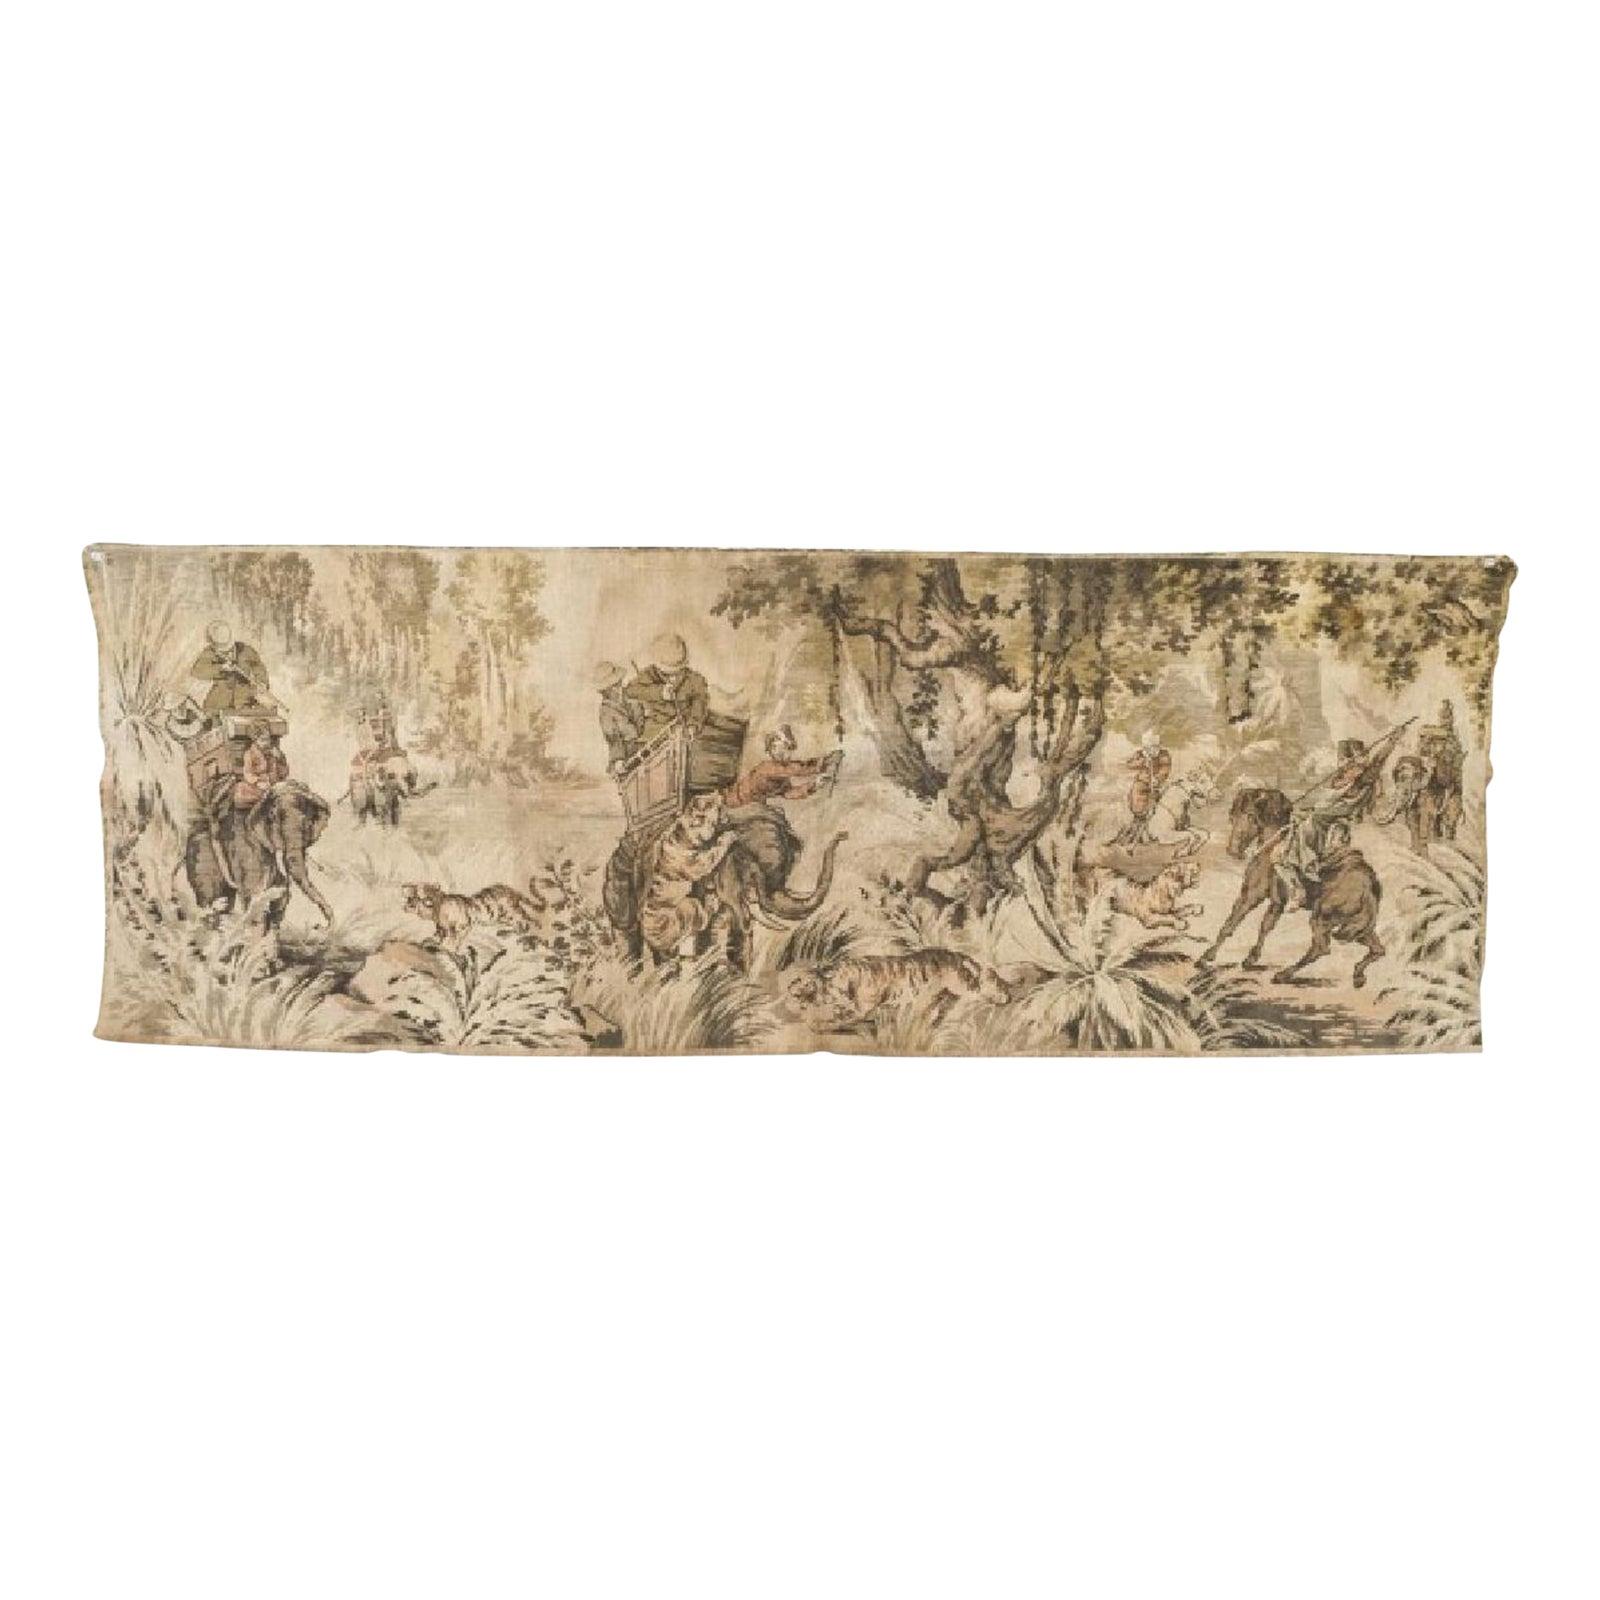 Antique French Hunt Tapestry Vintage Dutch Belgian